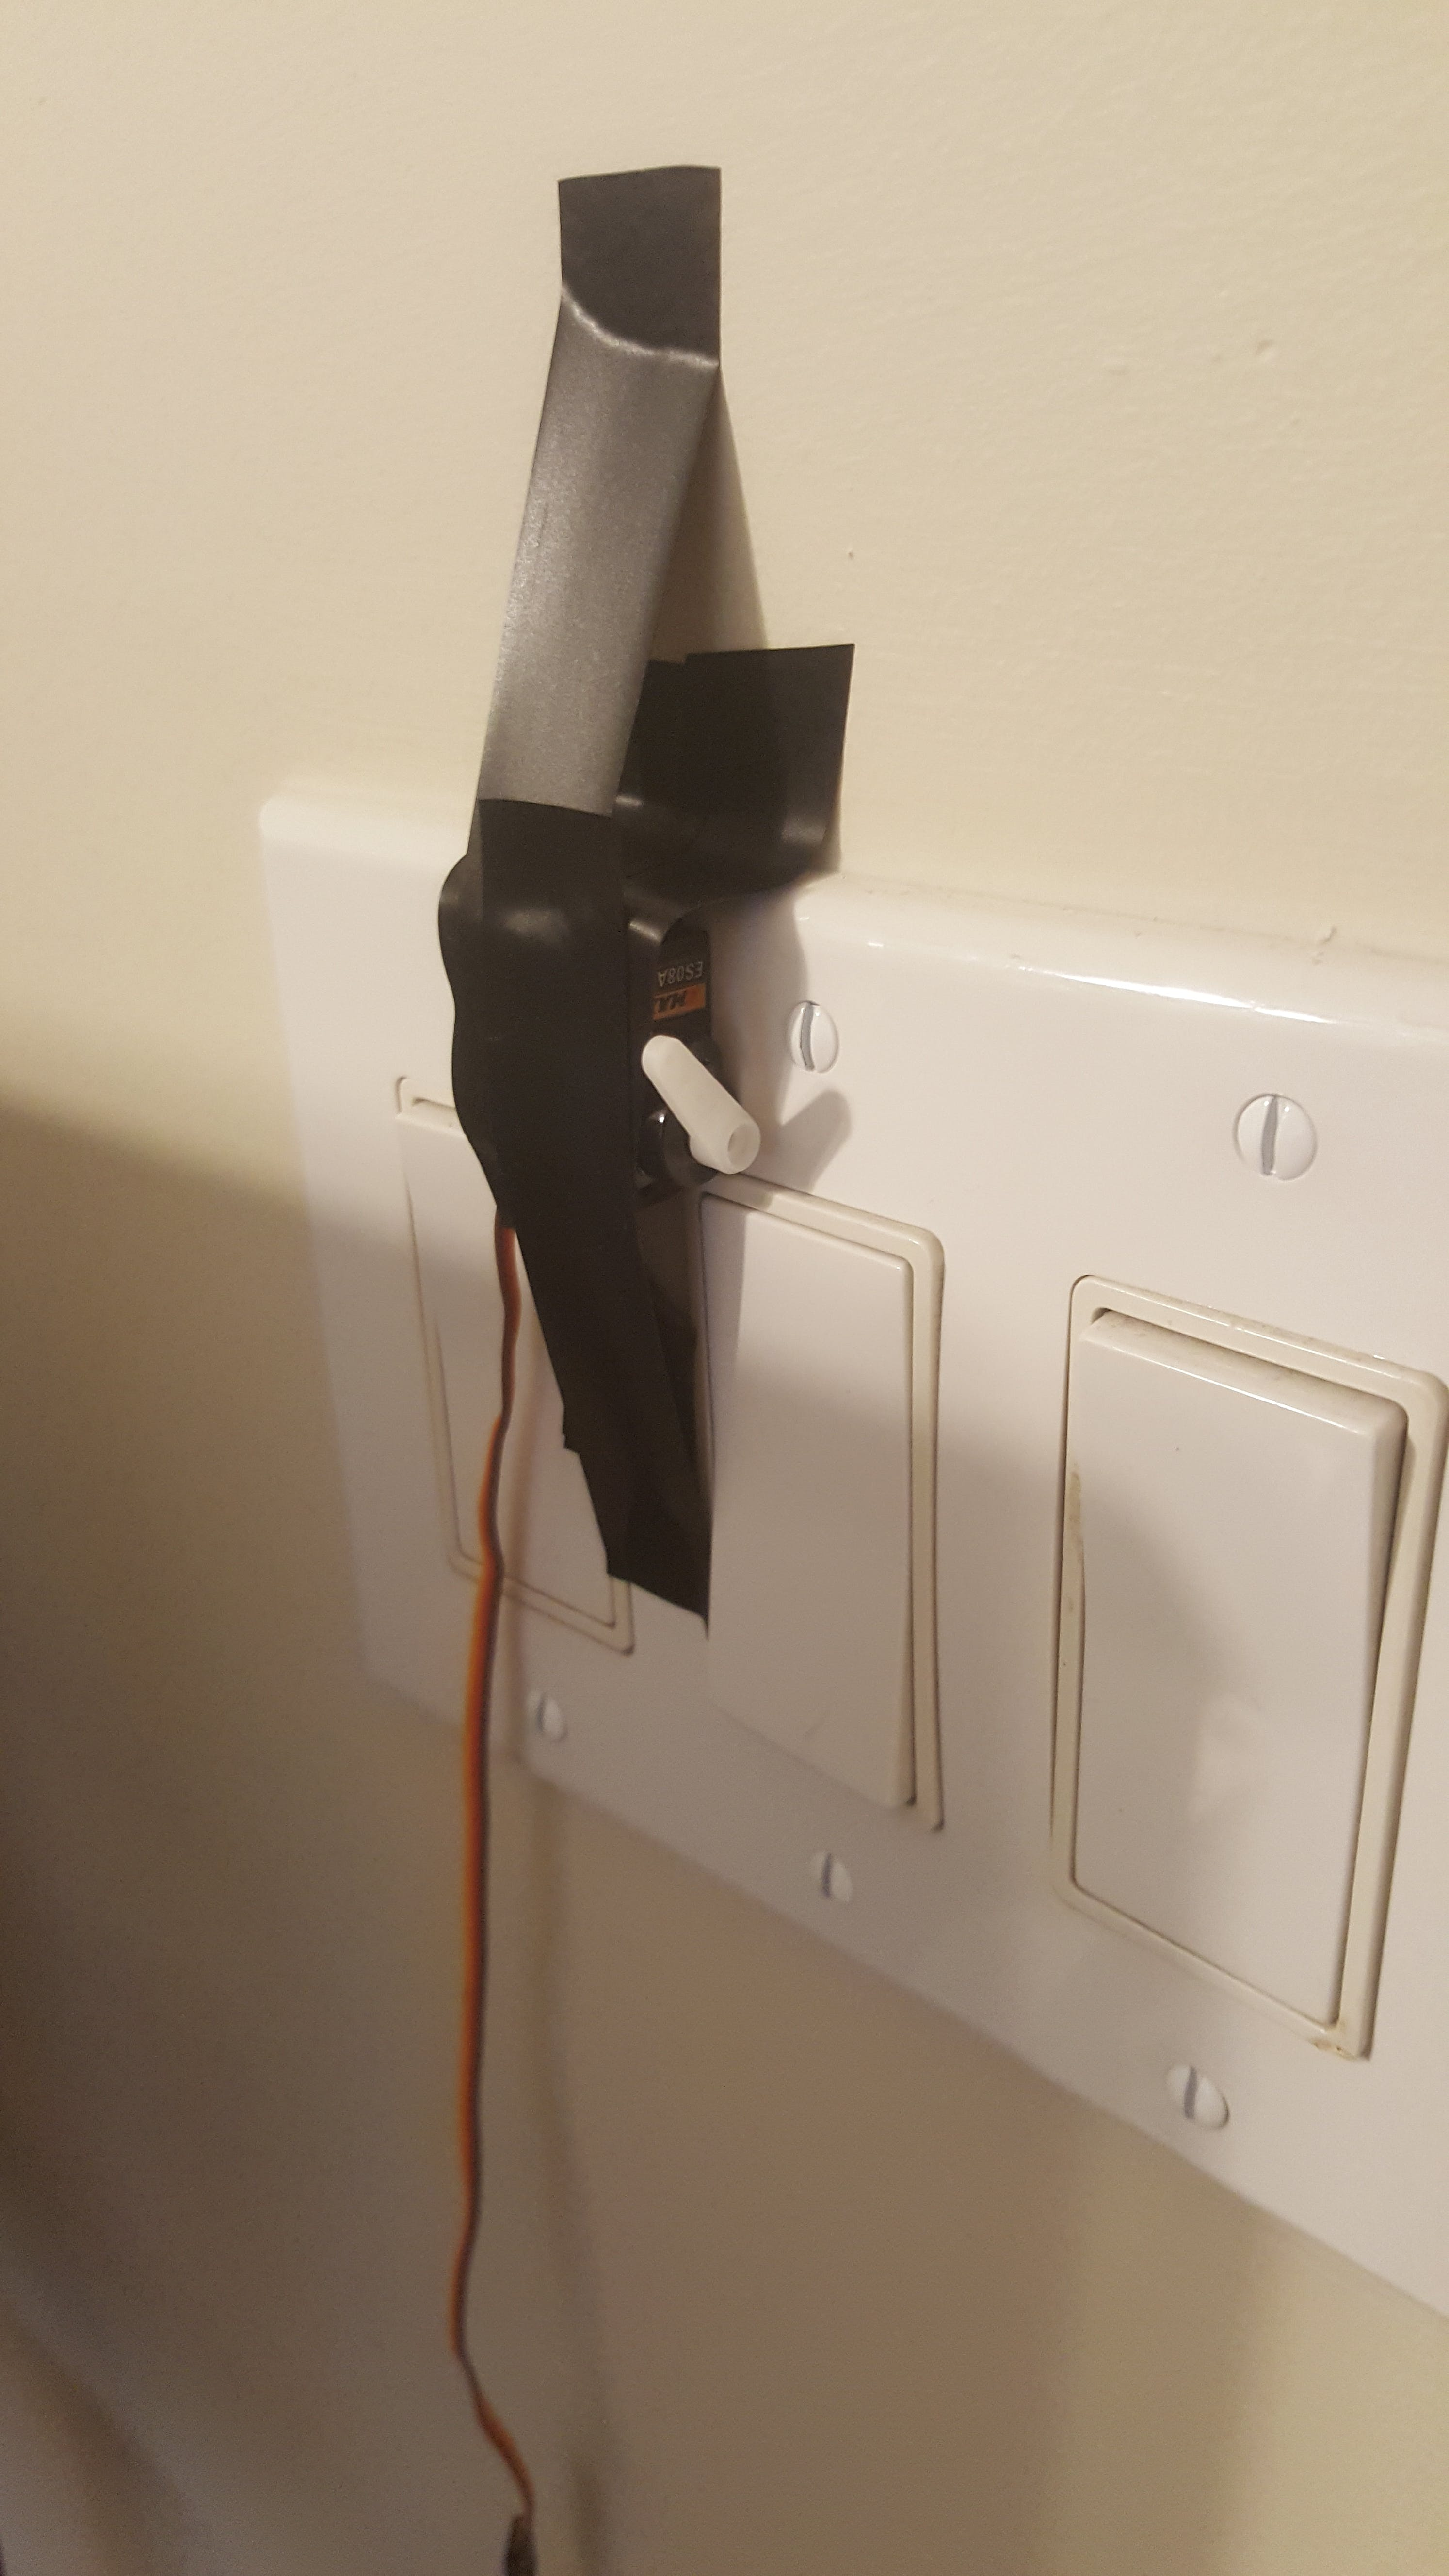 Light Switch Mechanism